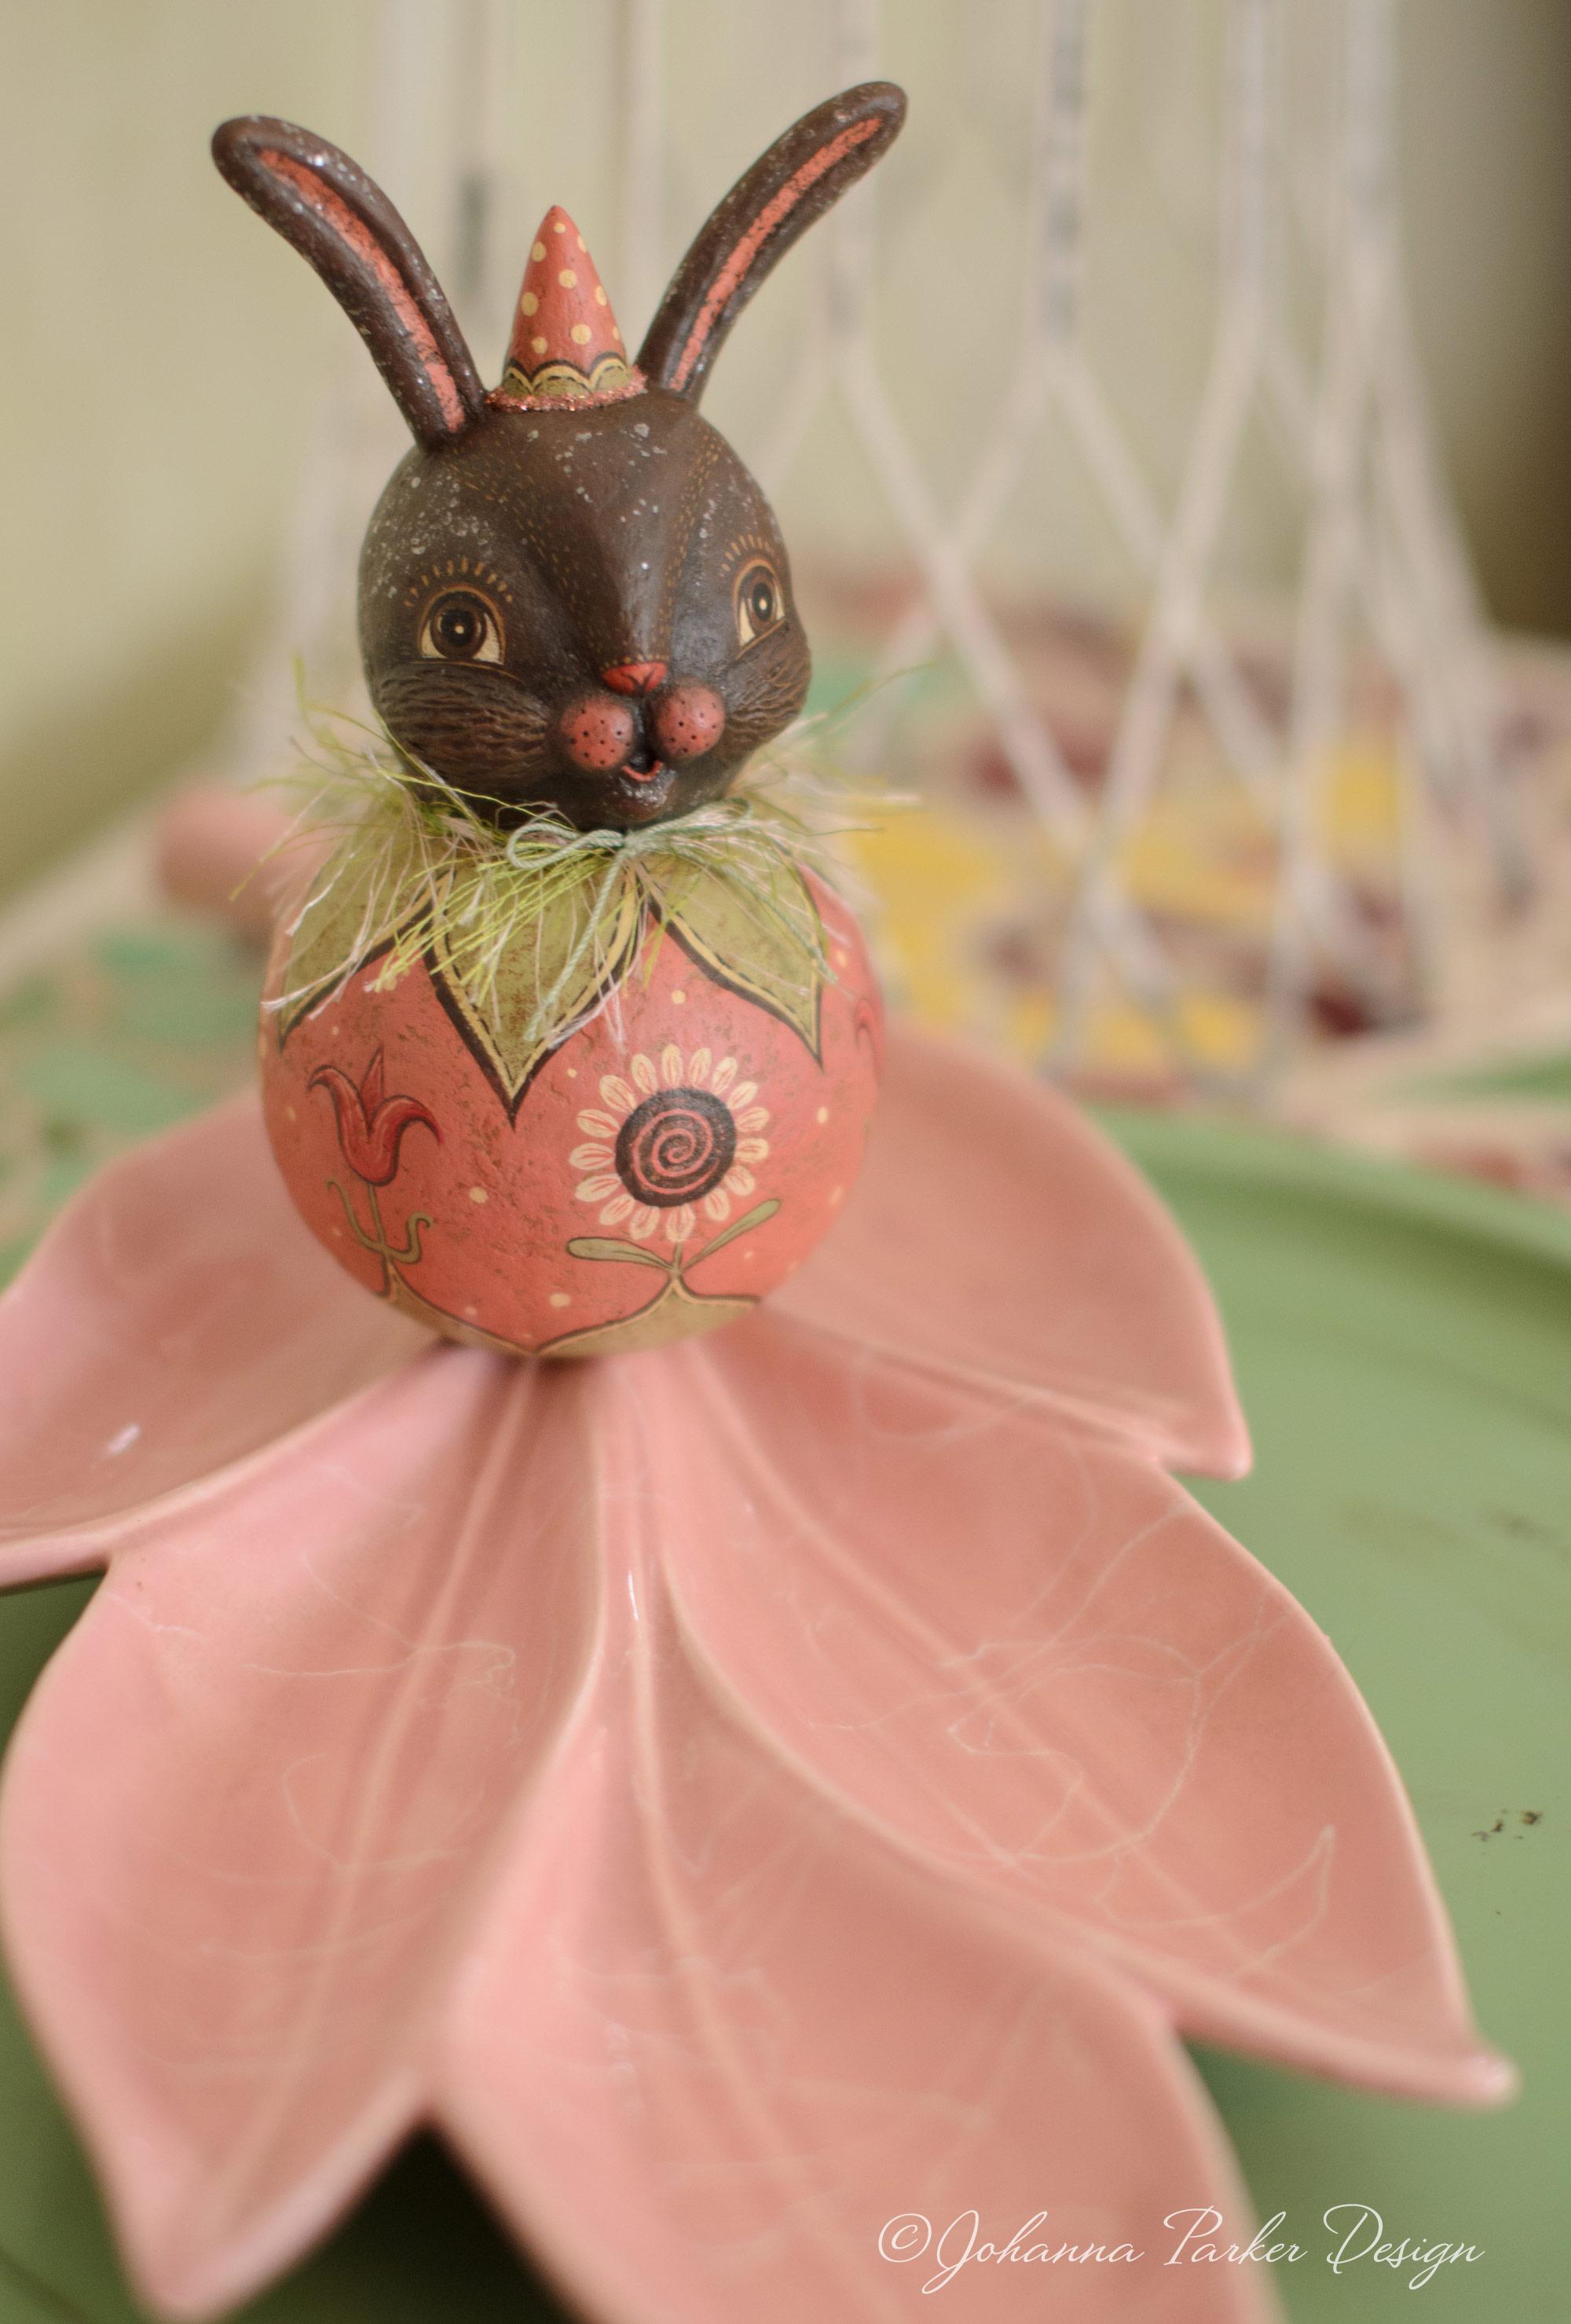 Pink bunny ball character